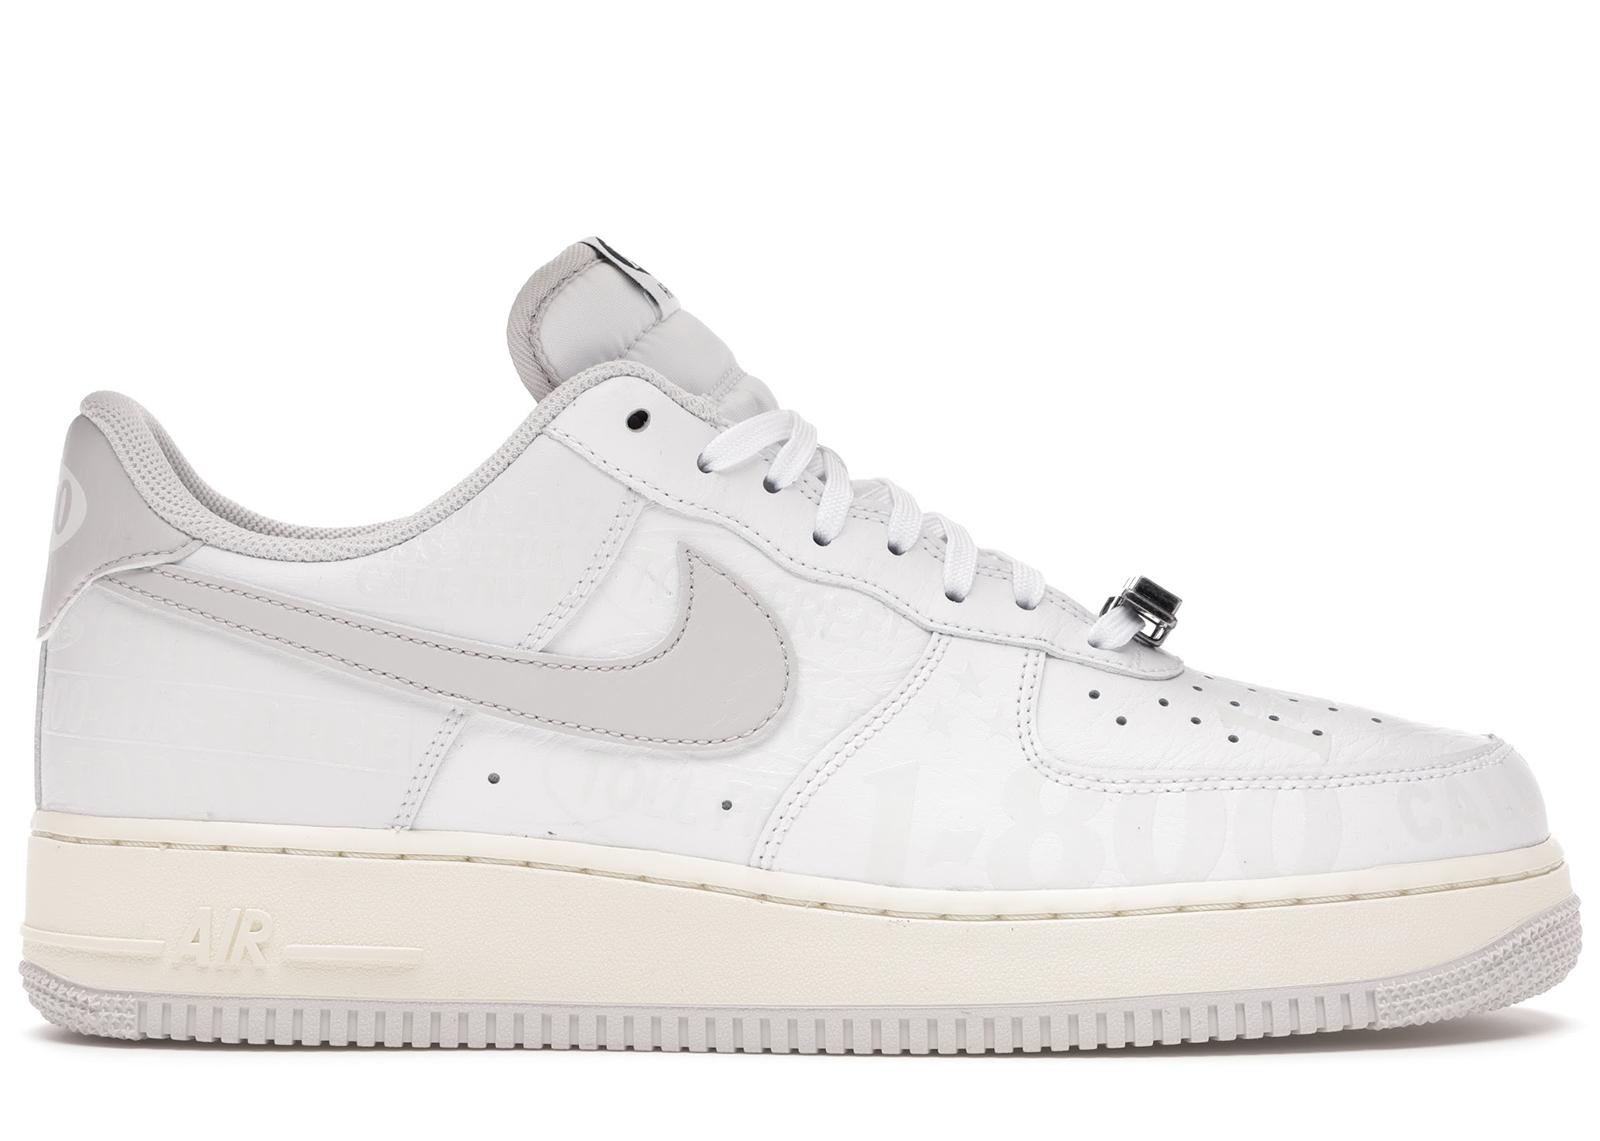 Nike Air Force 1 Low 1-800 - CJ1631-100